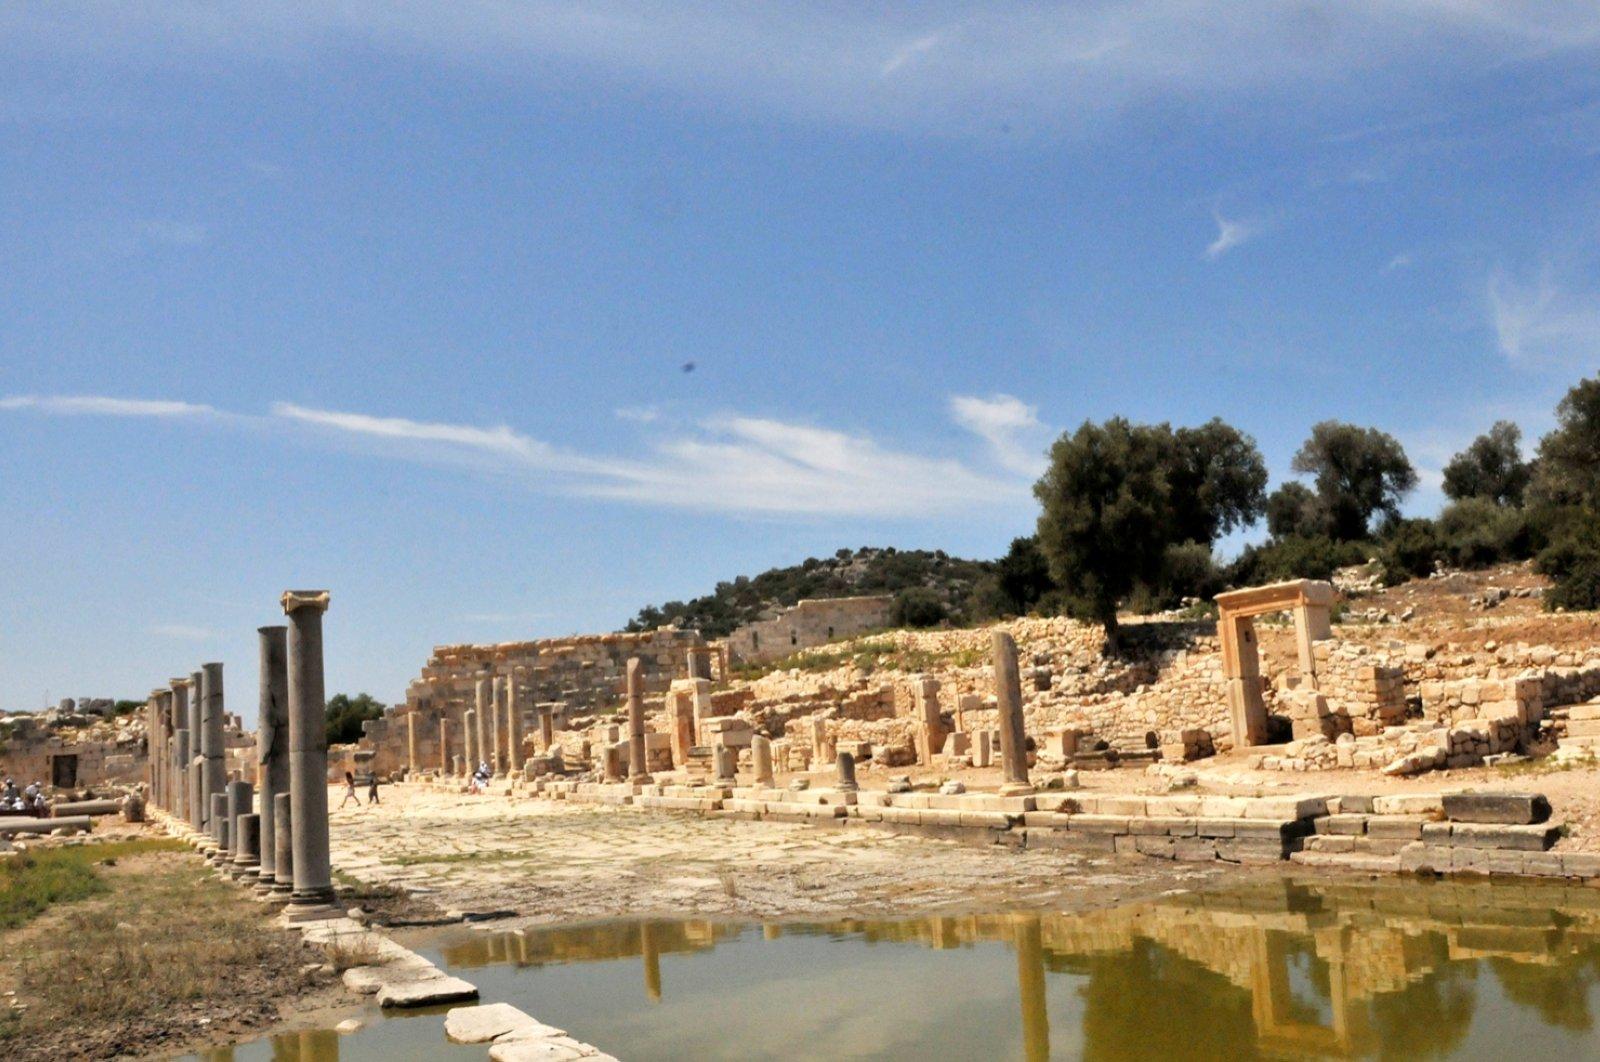 A photo from the ancient city of Patara, Antalya, southern Turkey, Aug. 13, 2020. (DHA PHOTO)